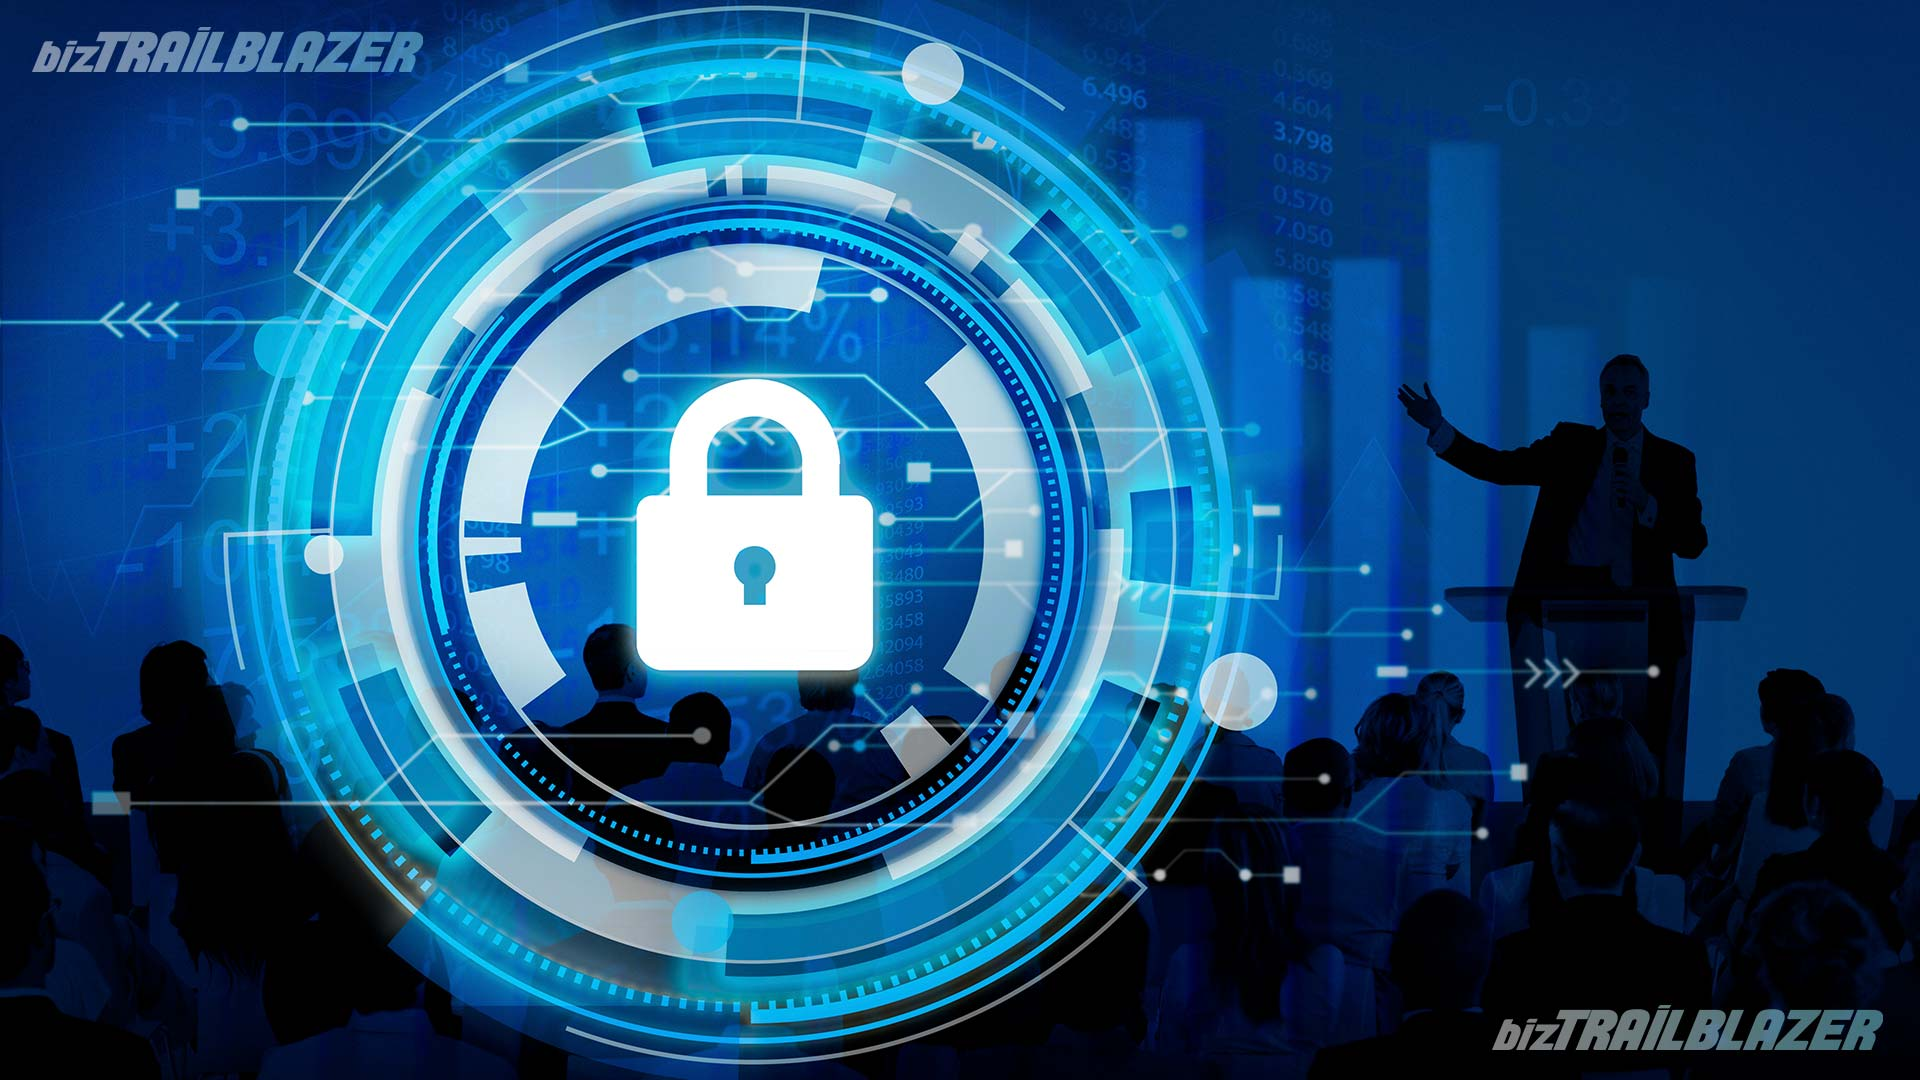 How-Cyber-Criminals-are-Causing-Disruptions---BizTrailblazer-Blog